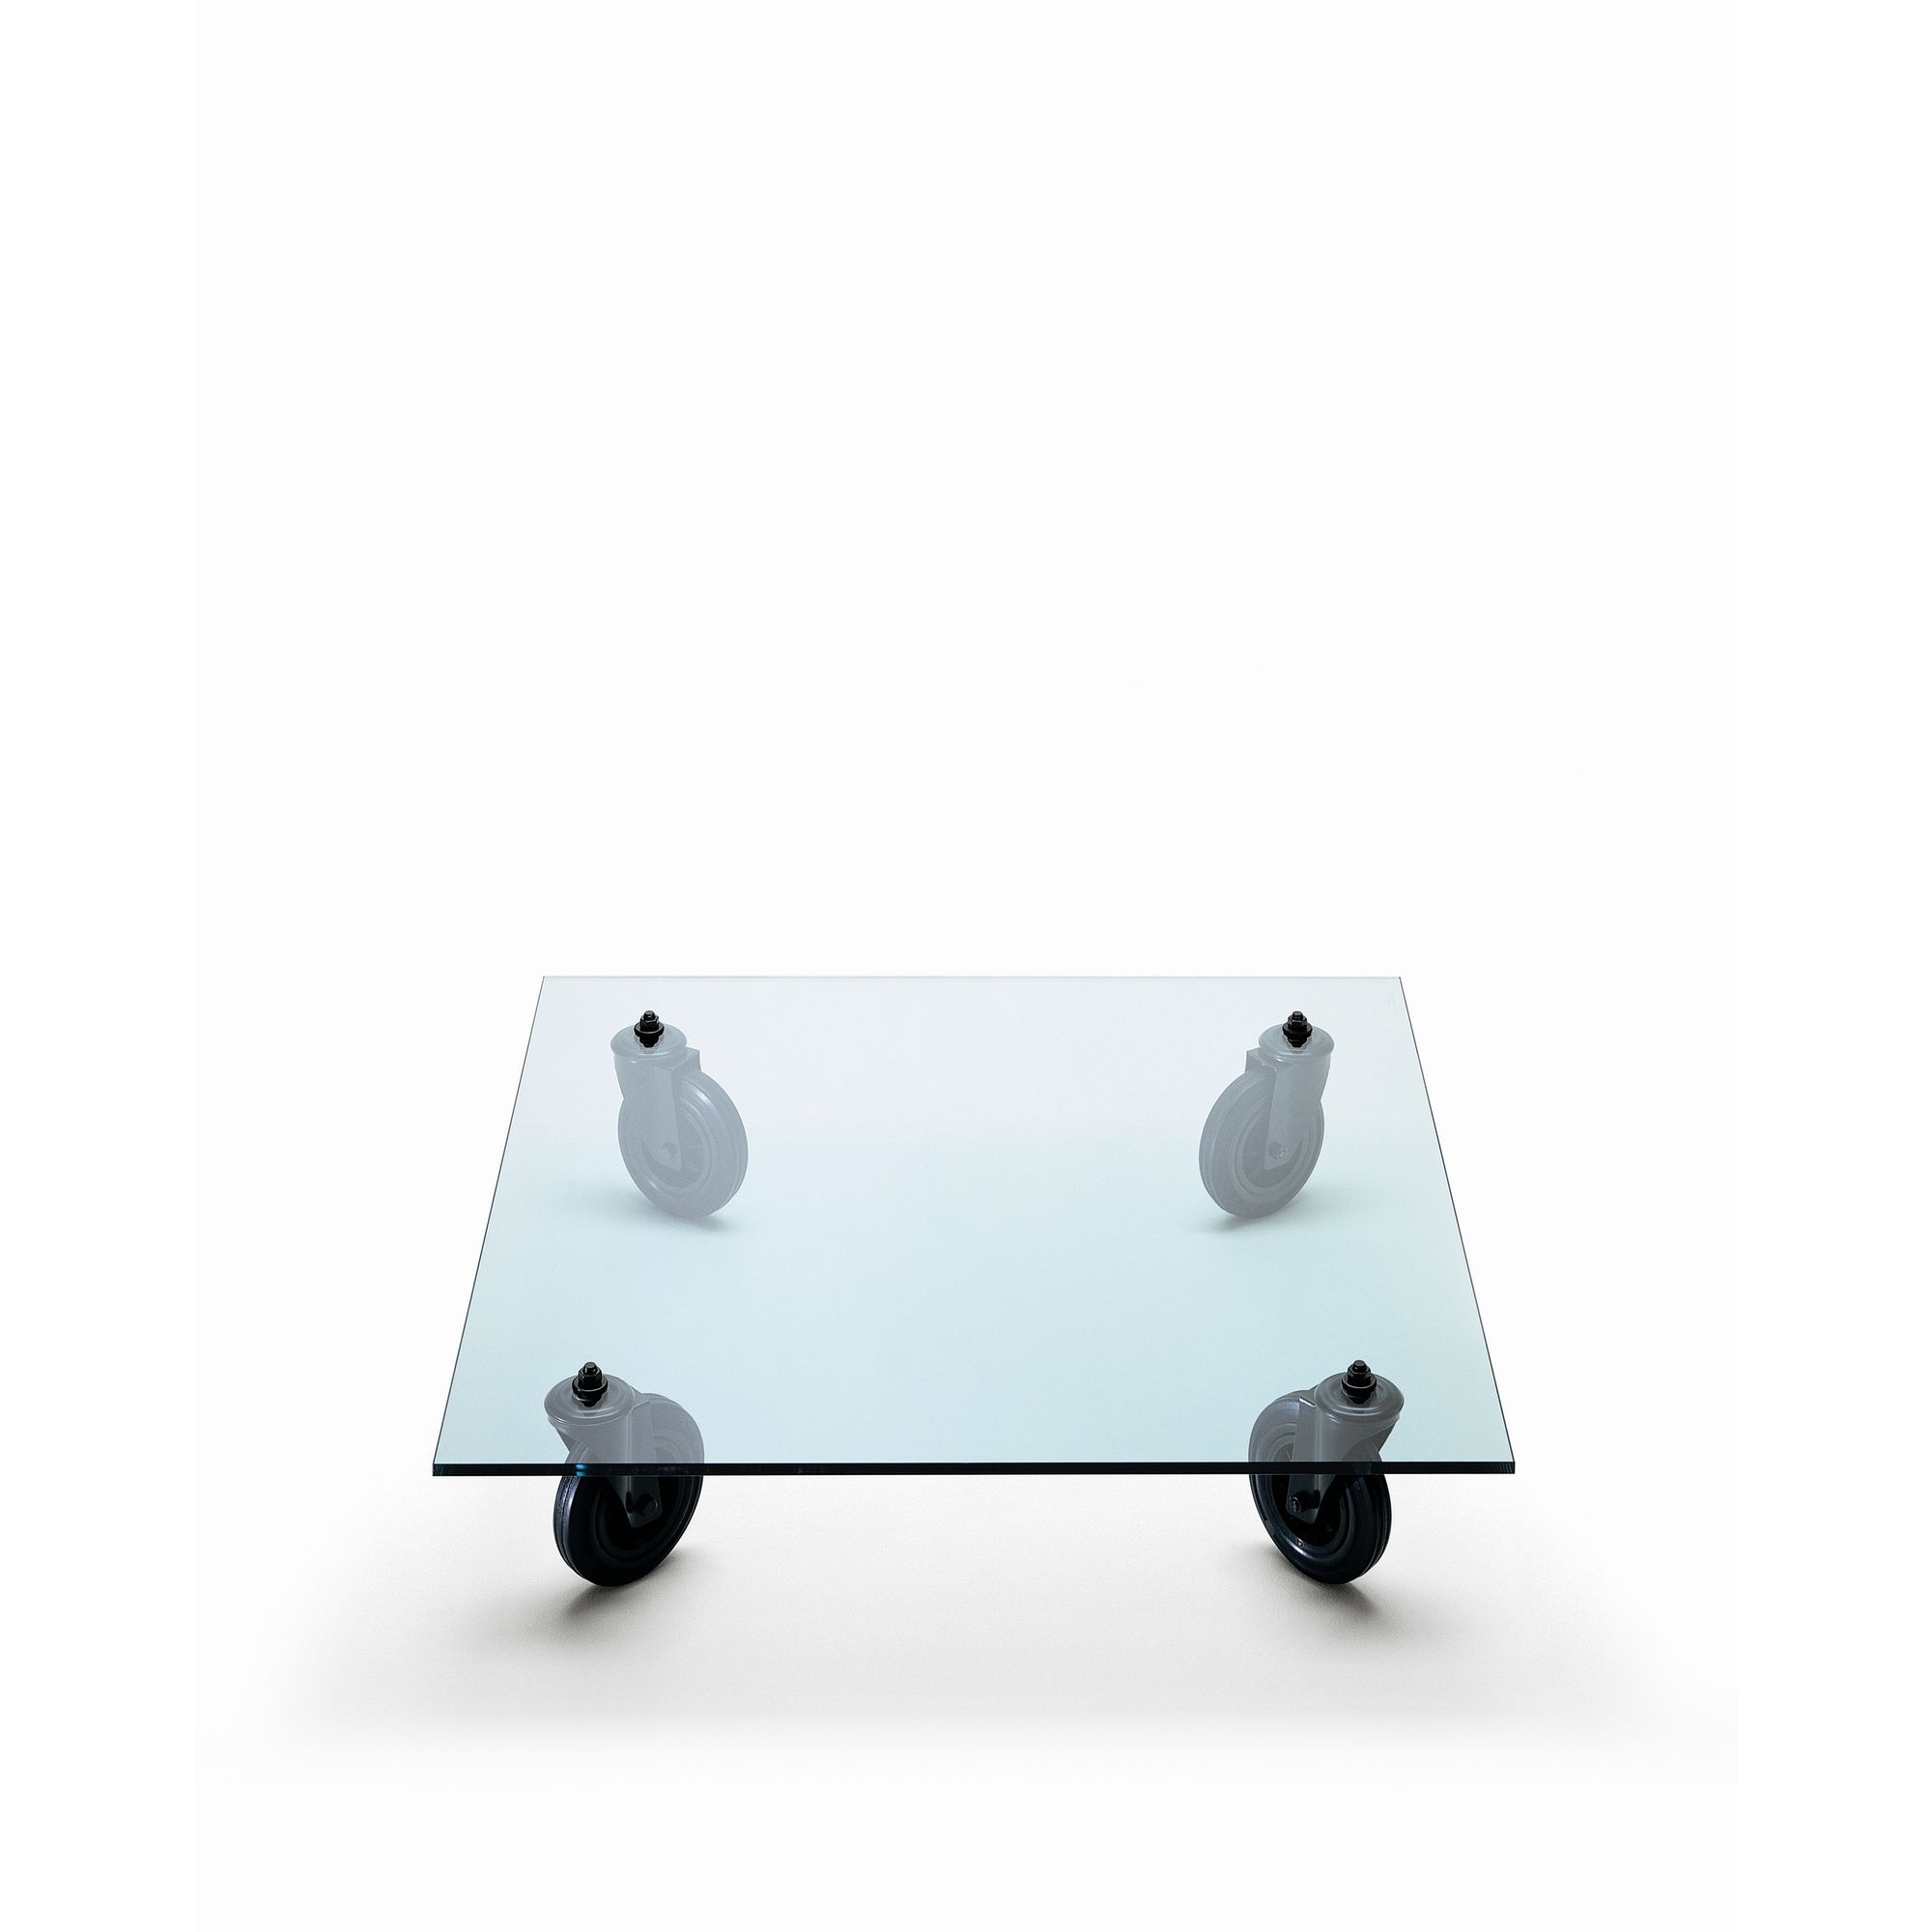 FontanaArte Tavolo Con Route Table - 140cm H X 70cm W X 25cm D at Tesco Direct